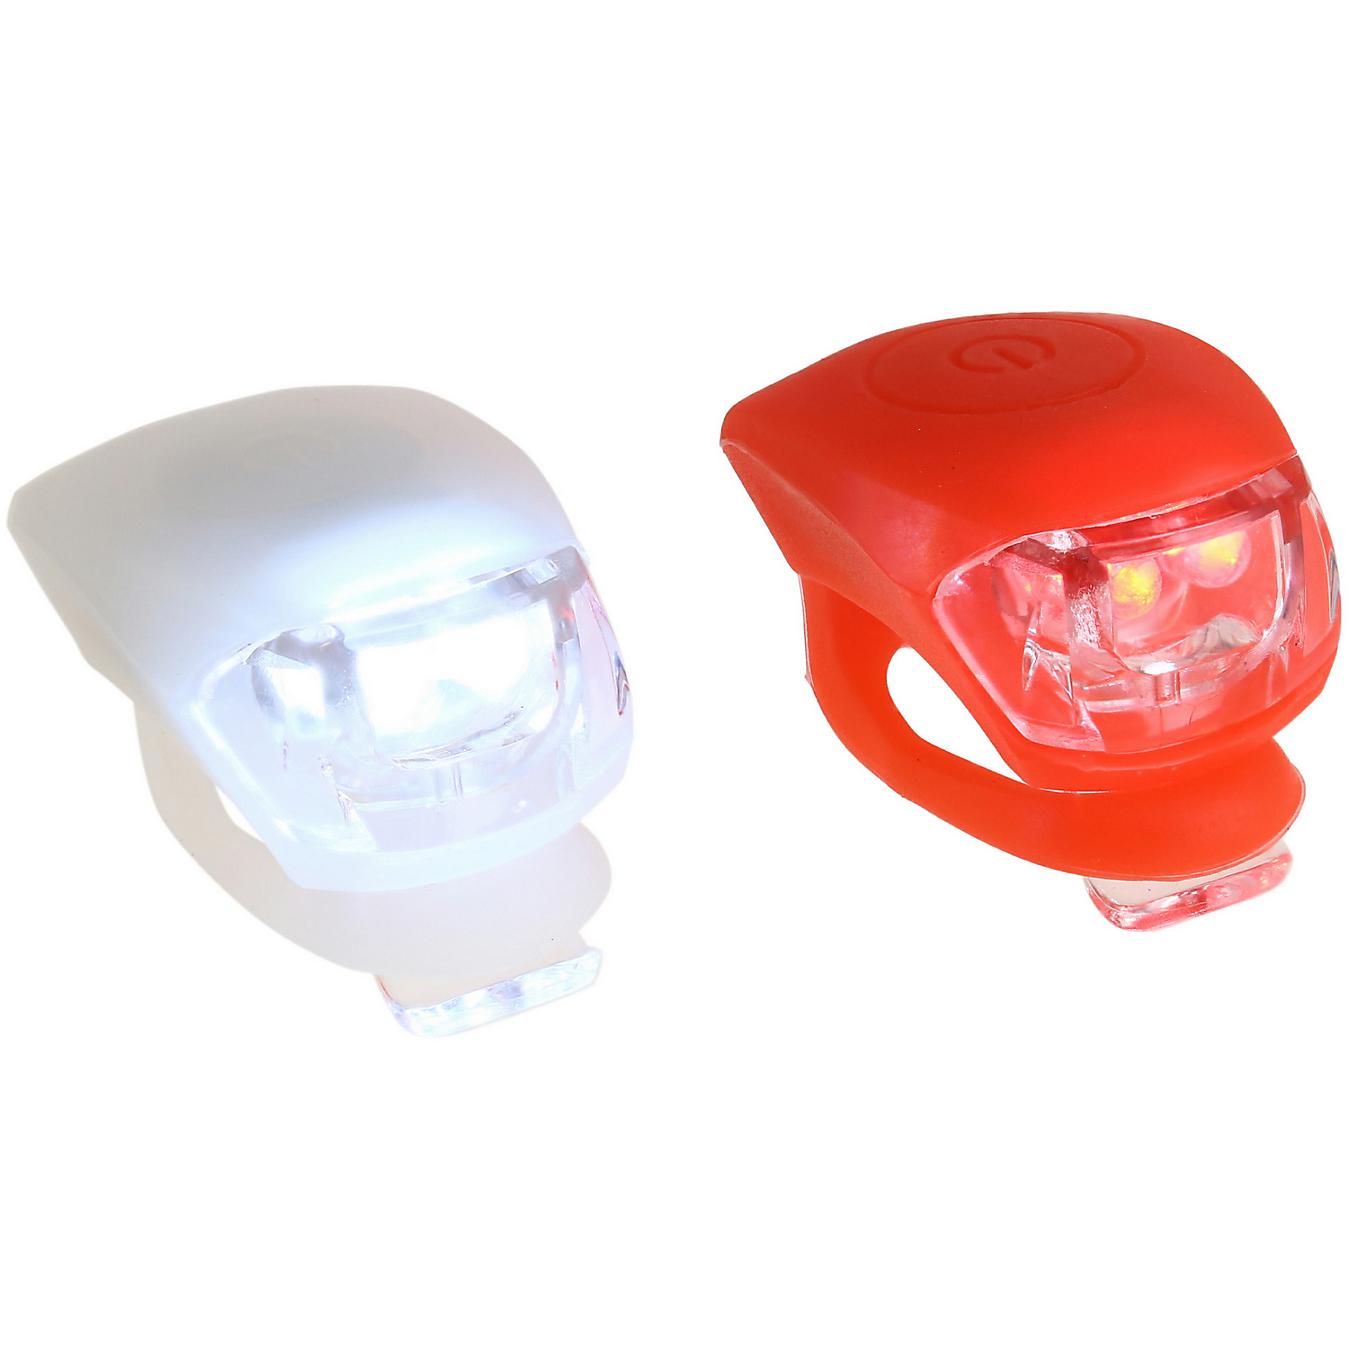 Beige Kentop Silicona desag/üe Tamiz Protectora Pelo atrapasue/ños Tope para Lavabo/ /Clogging Filtro para Cuarto de ba/ño Ducha Cocina 12.3 x 12.3 x 0.2 cm Silicona